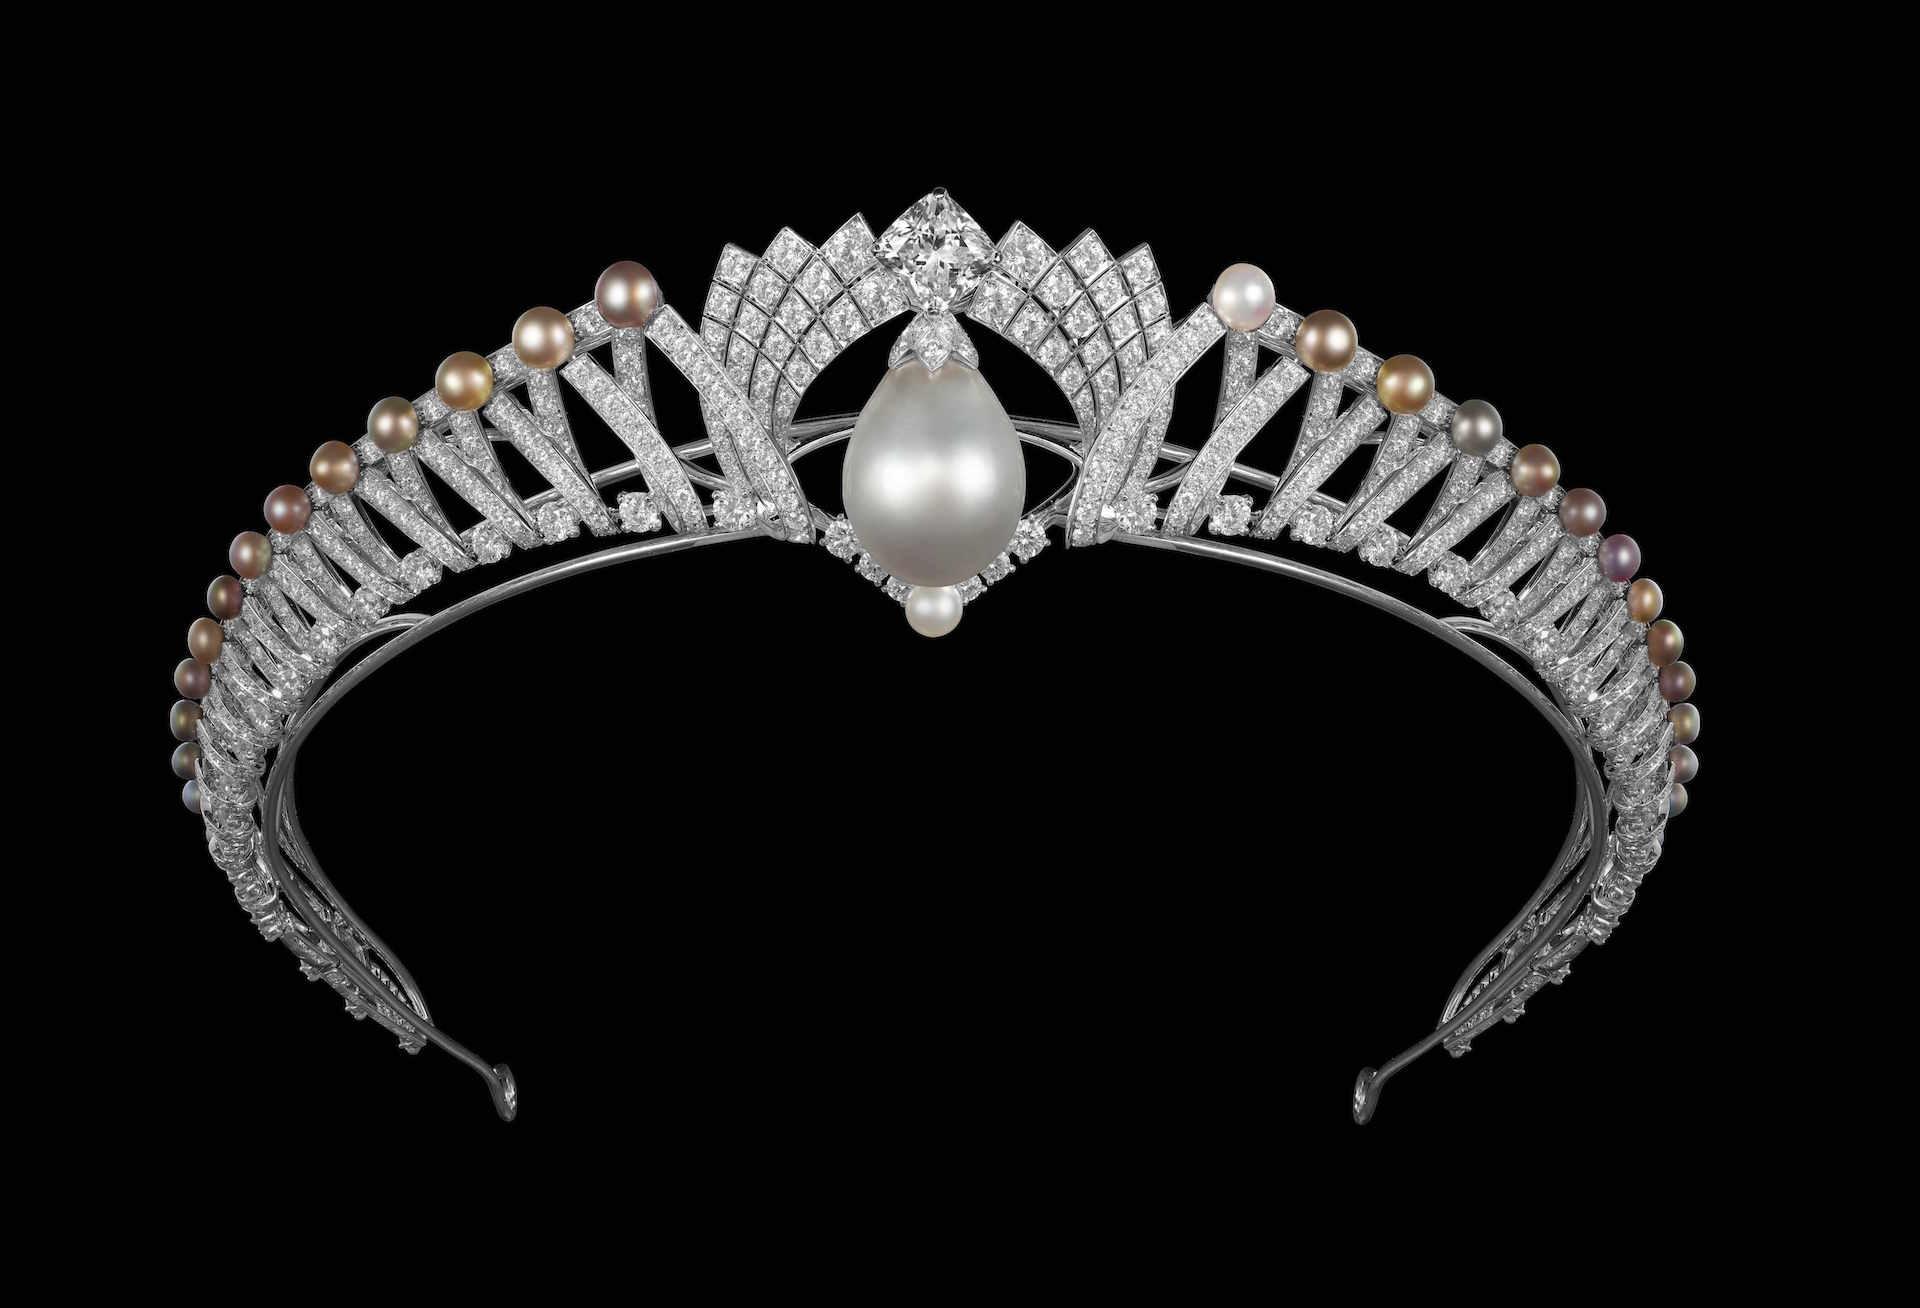 The Royal Tiara